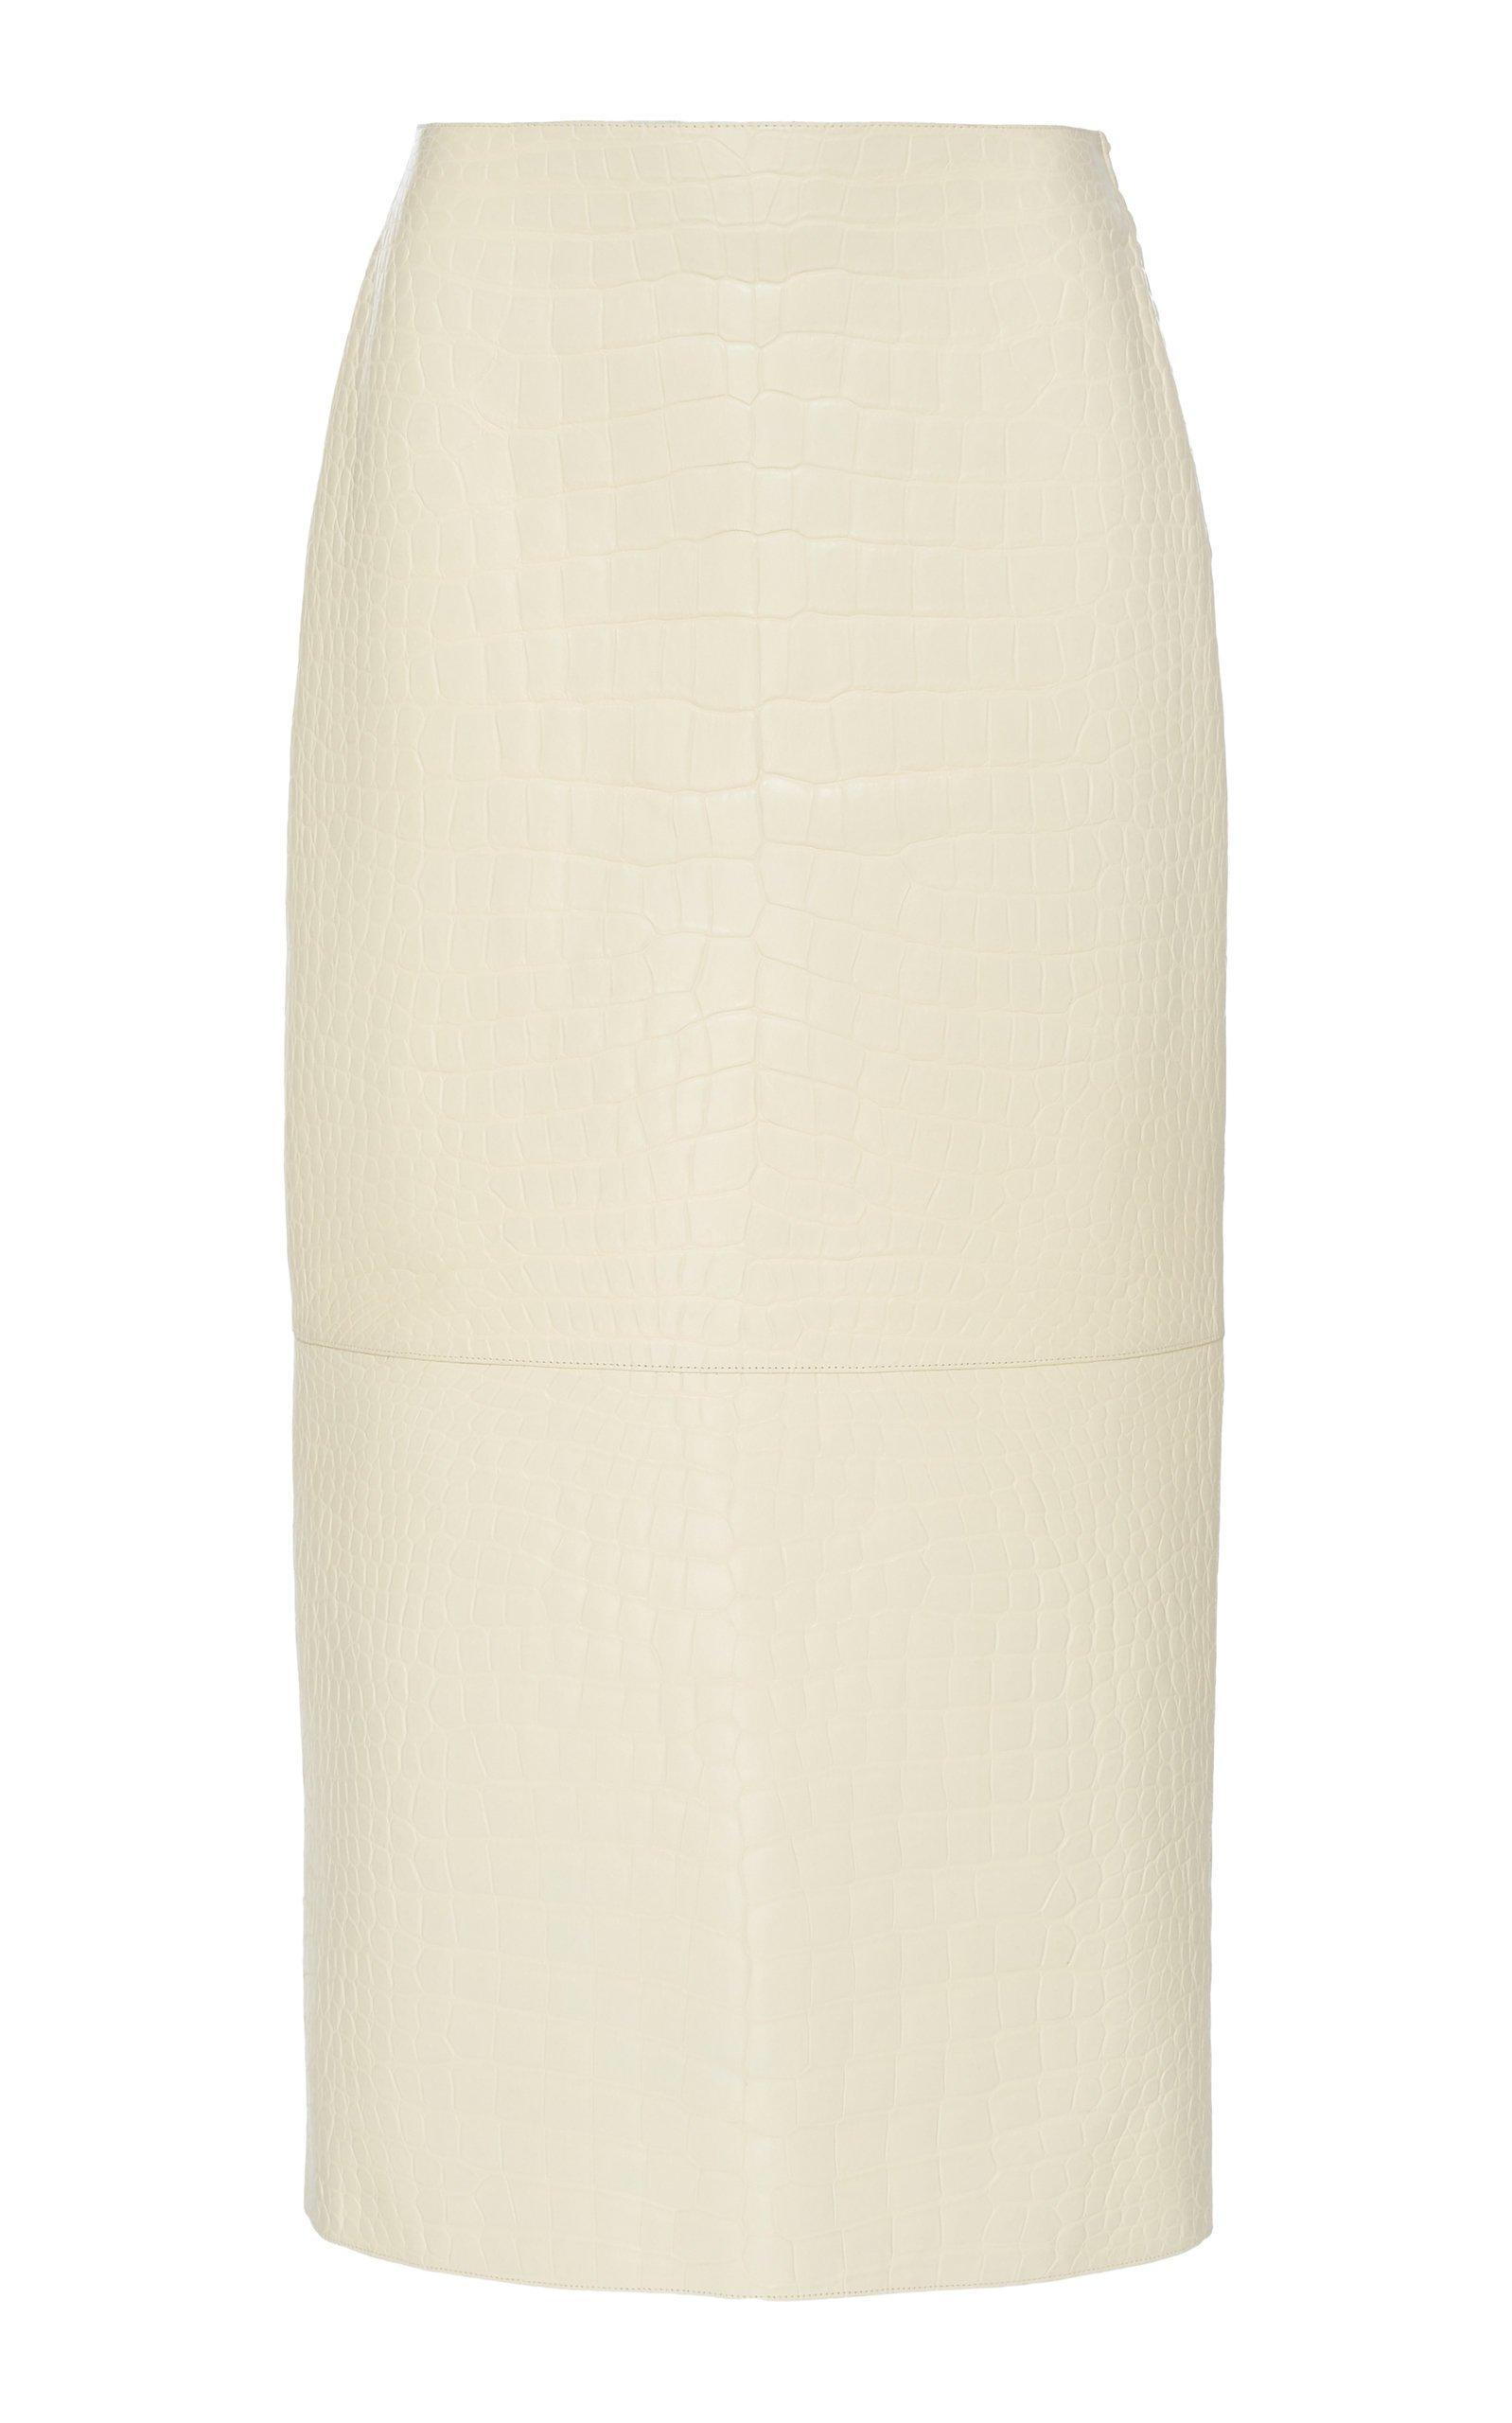 The Row Jenna Crocodile Midi Skirt Size: 0